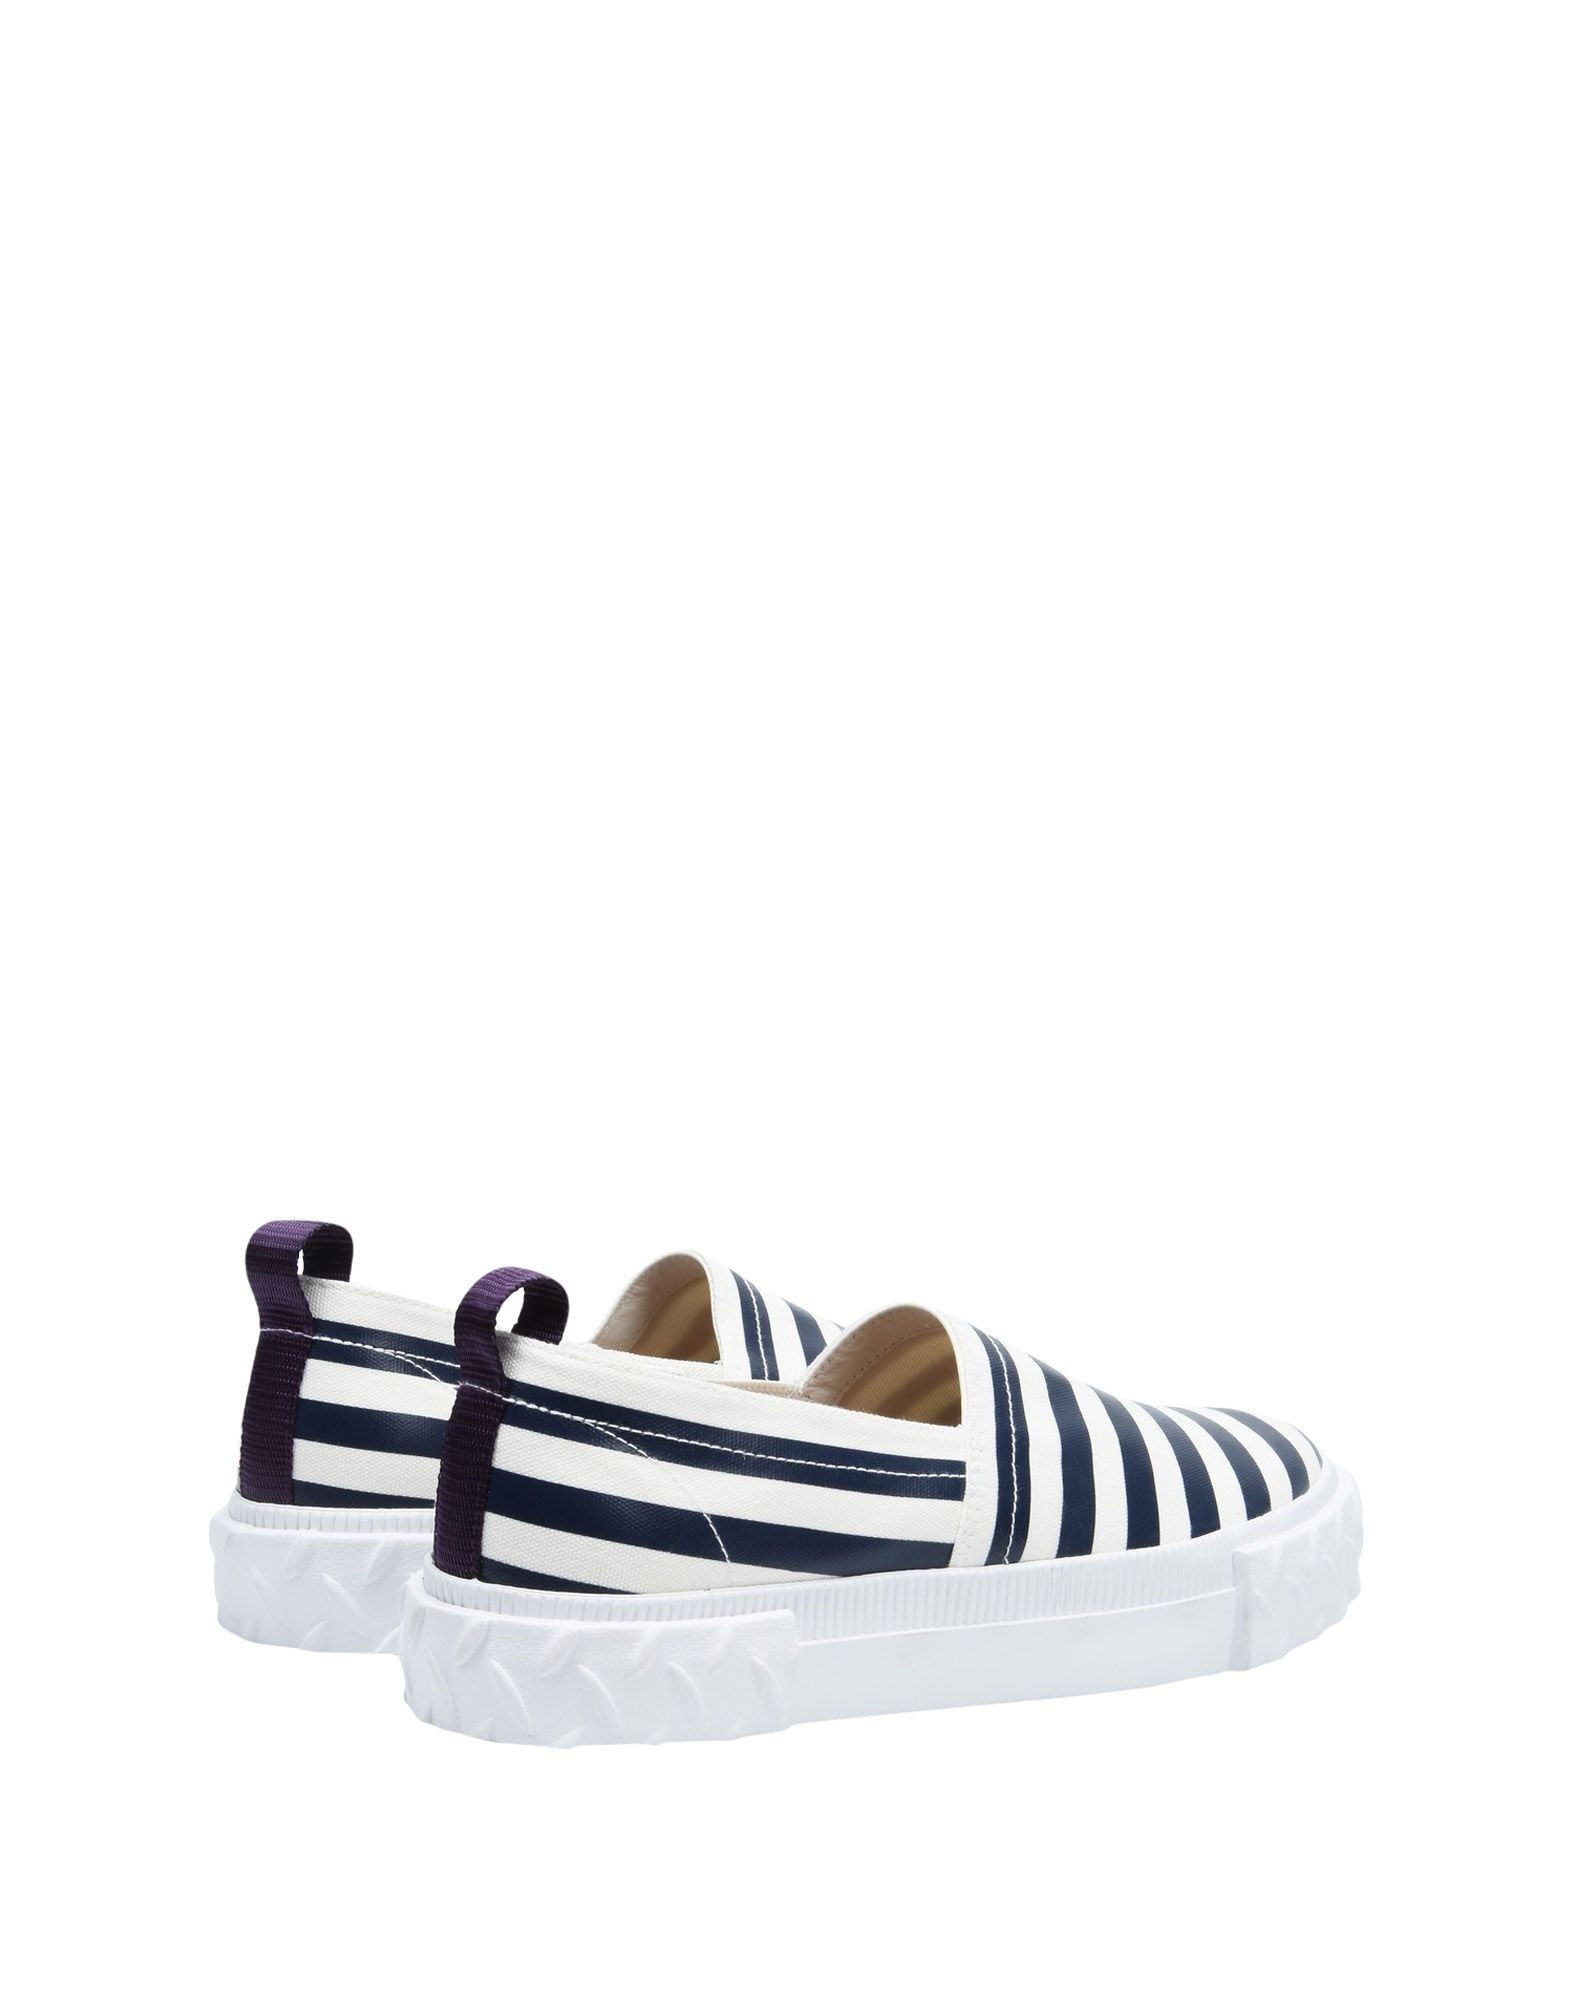 Eytys Sneakers - Women Eytys Eytys Eytys Sneakers online on  Canada - 11464608OP 98d1d5